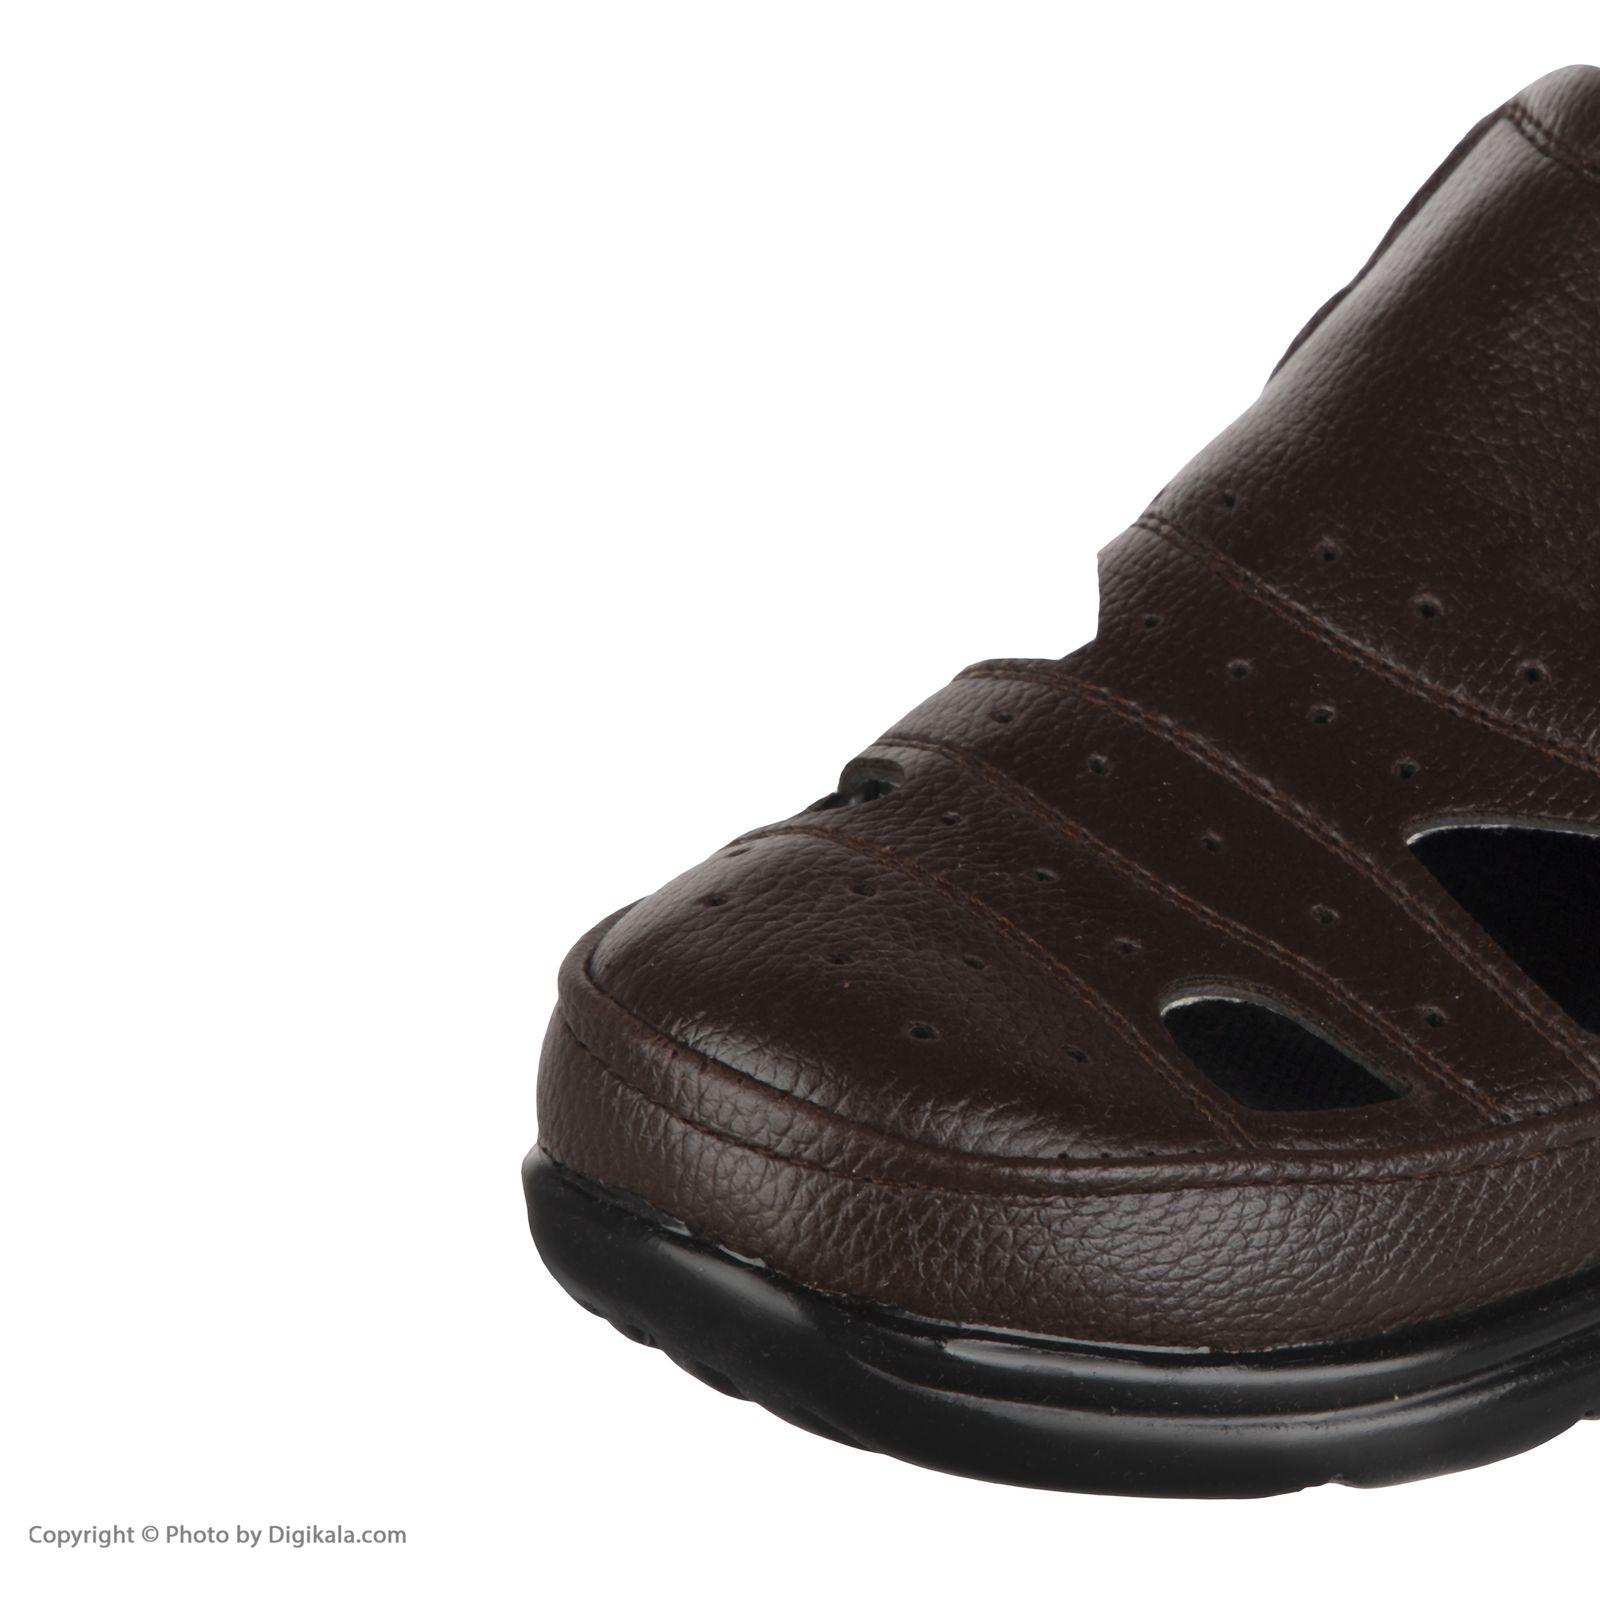 کفش روزمره مردانه مدل k.baz.076 -  - 8